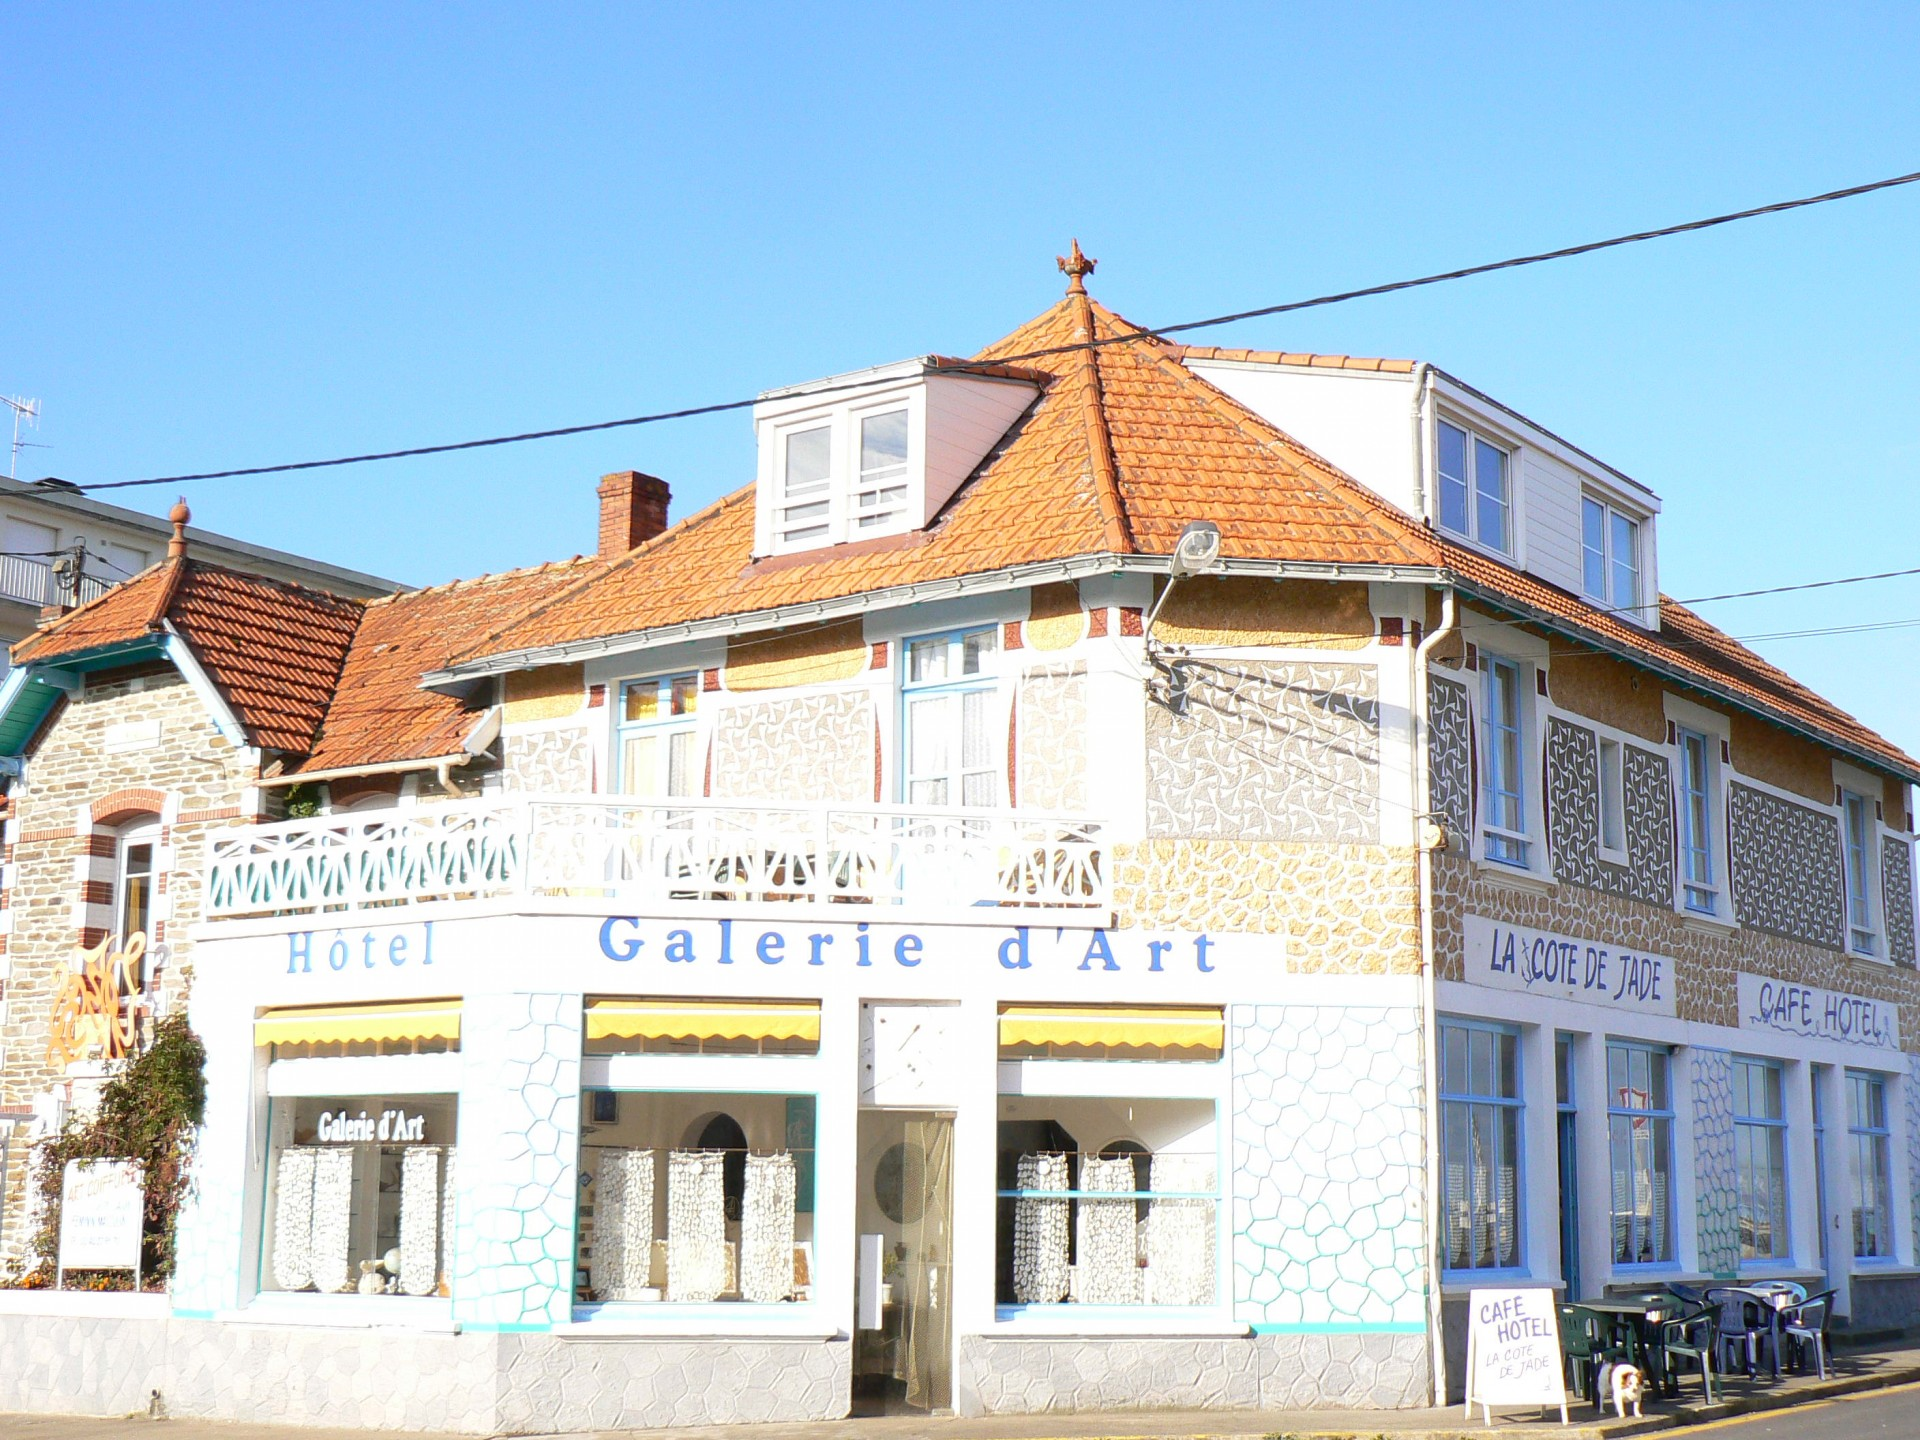 hôtel, Côte de Jade, cote de jade, hotel tharon, hôtel tharon plage, hôtel st michel chef chef